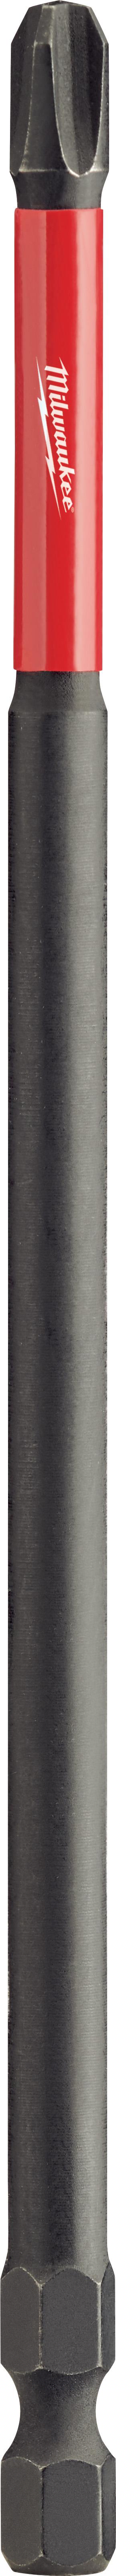 Milwaukee® 48-32-4208 Shockwave™ Impact Driver Bit, NO 3 Phillips® Point, 6 in OAL, 1/4 in, Custom Alloy76™ Steel